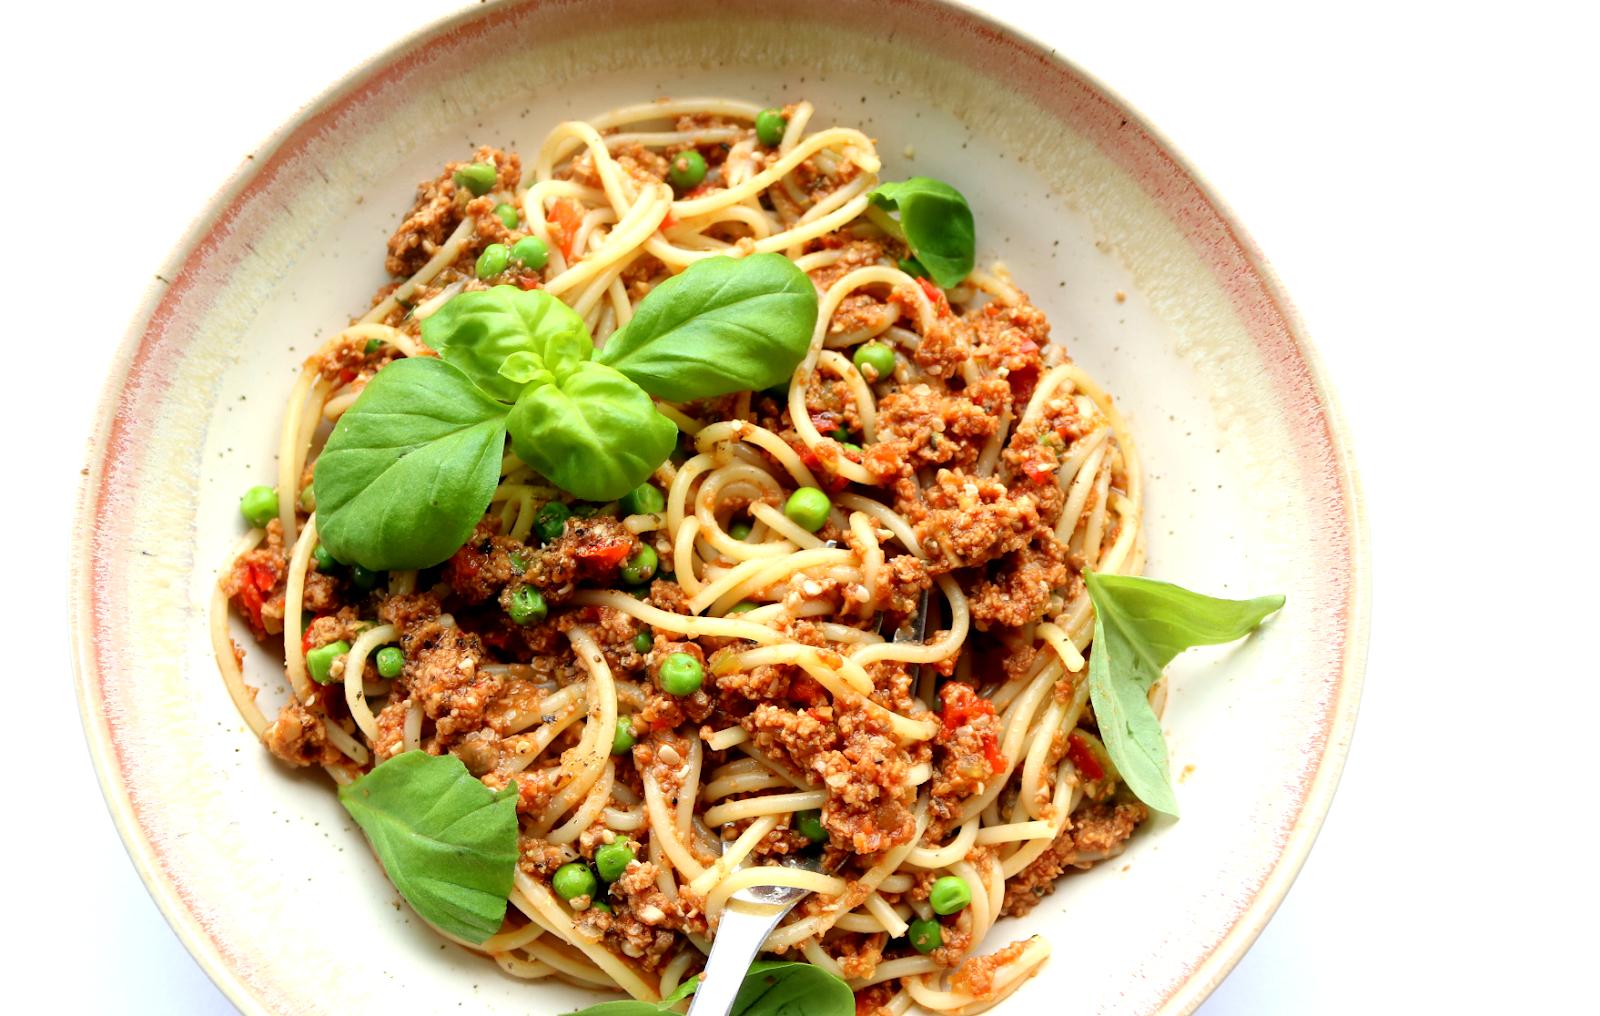 Vegan Spaghetti Bolognese (Dairy-Free recipe) #Veganuary